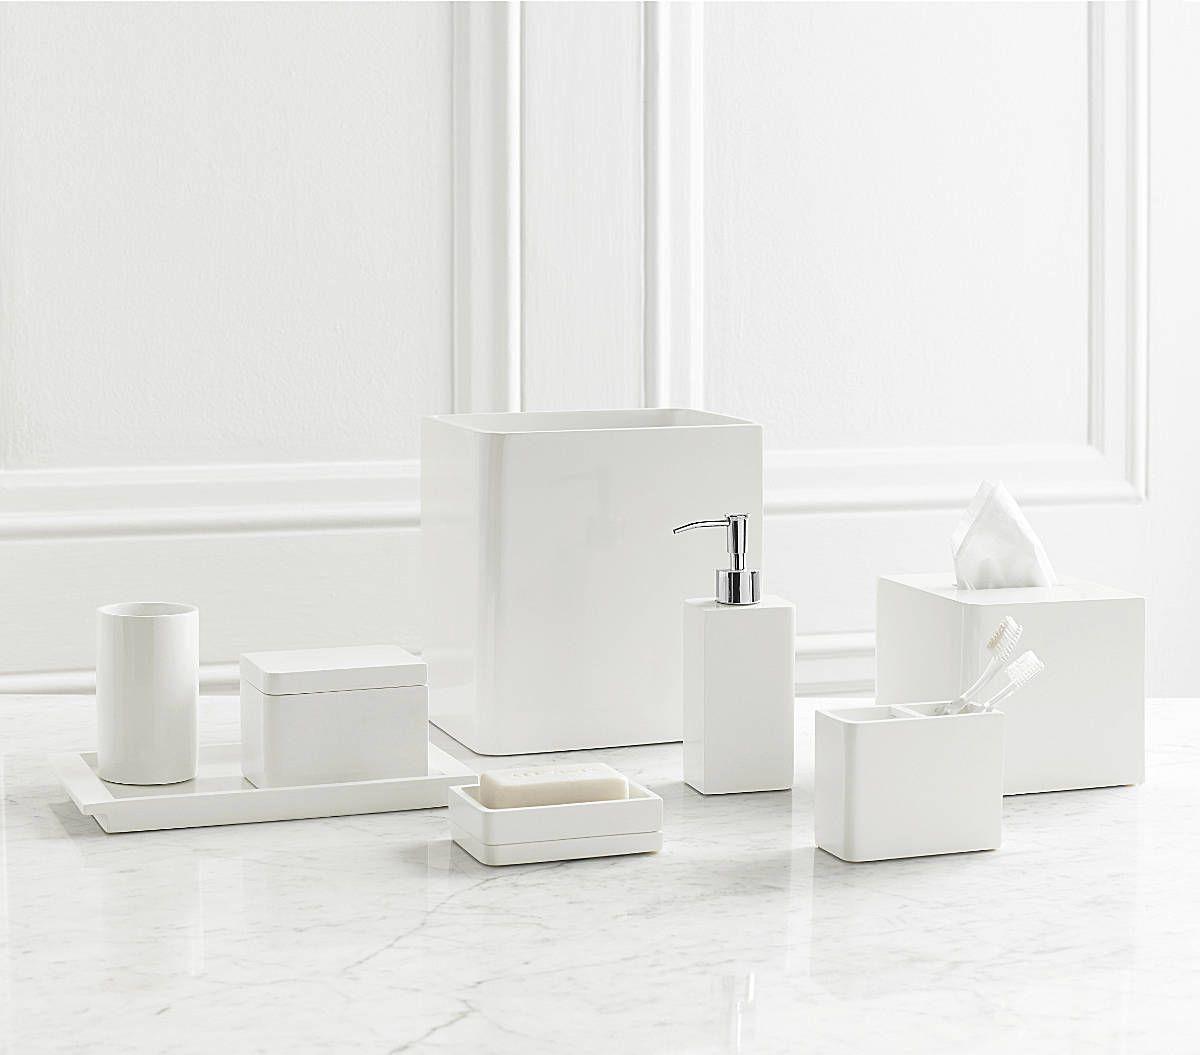 Lacca Bath Accessories | Bath | Pinterest | Bath accessories, Soap ...